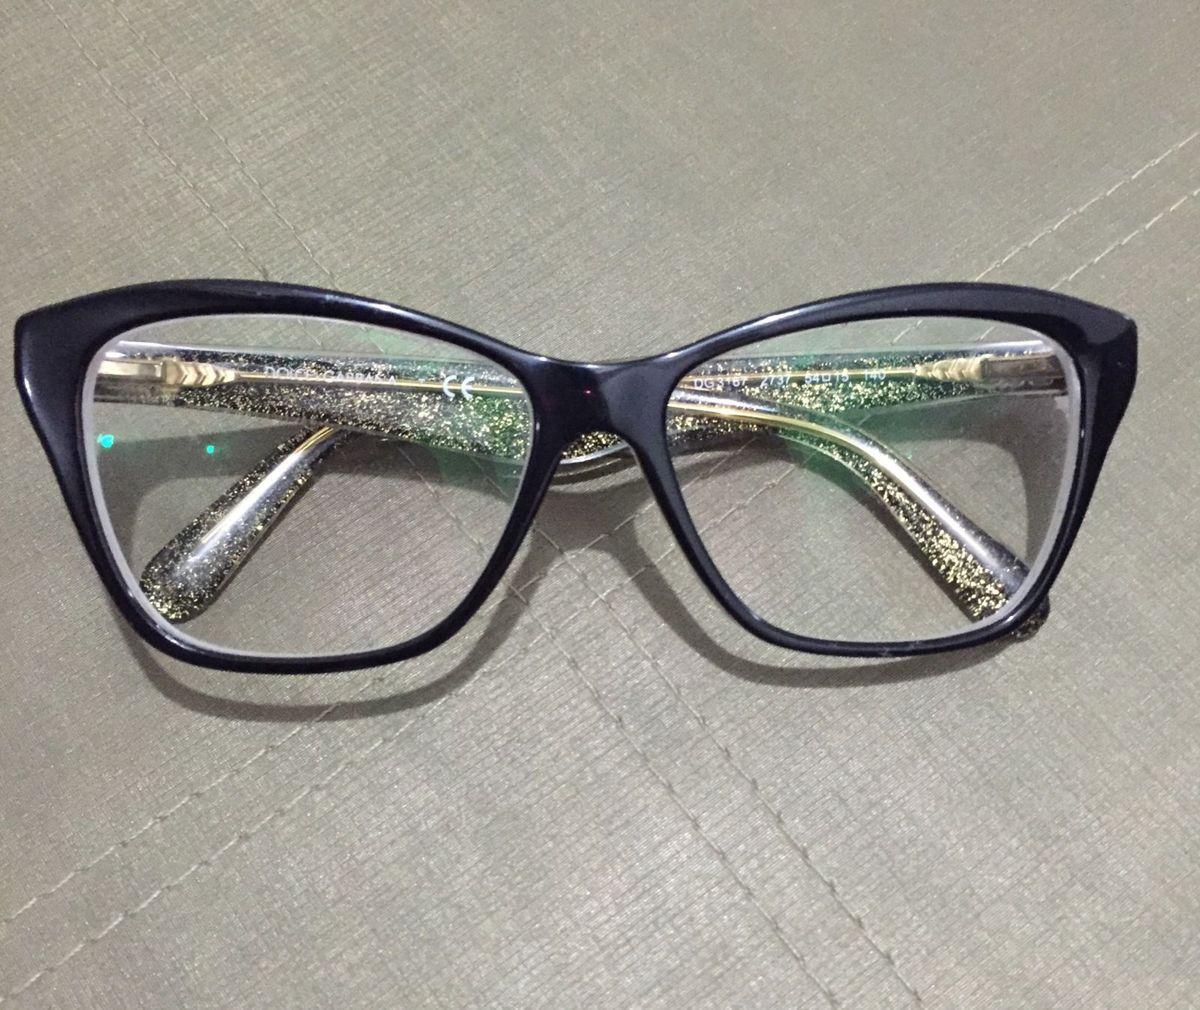 751a77c565350 chuva de glitter - óculos dolce   gabbana.  Czm6ly9wag90b3muzw5qb2vplmnvbs5ici9wcm9kdwn0cy8ynjq1otcvyzhkyzg1ngjknzc5ymm5ntzln2rhmjrimwy4njrinwyuanbn  ...